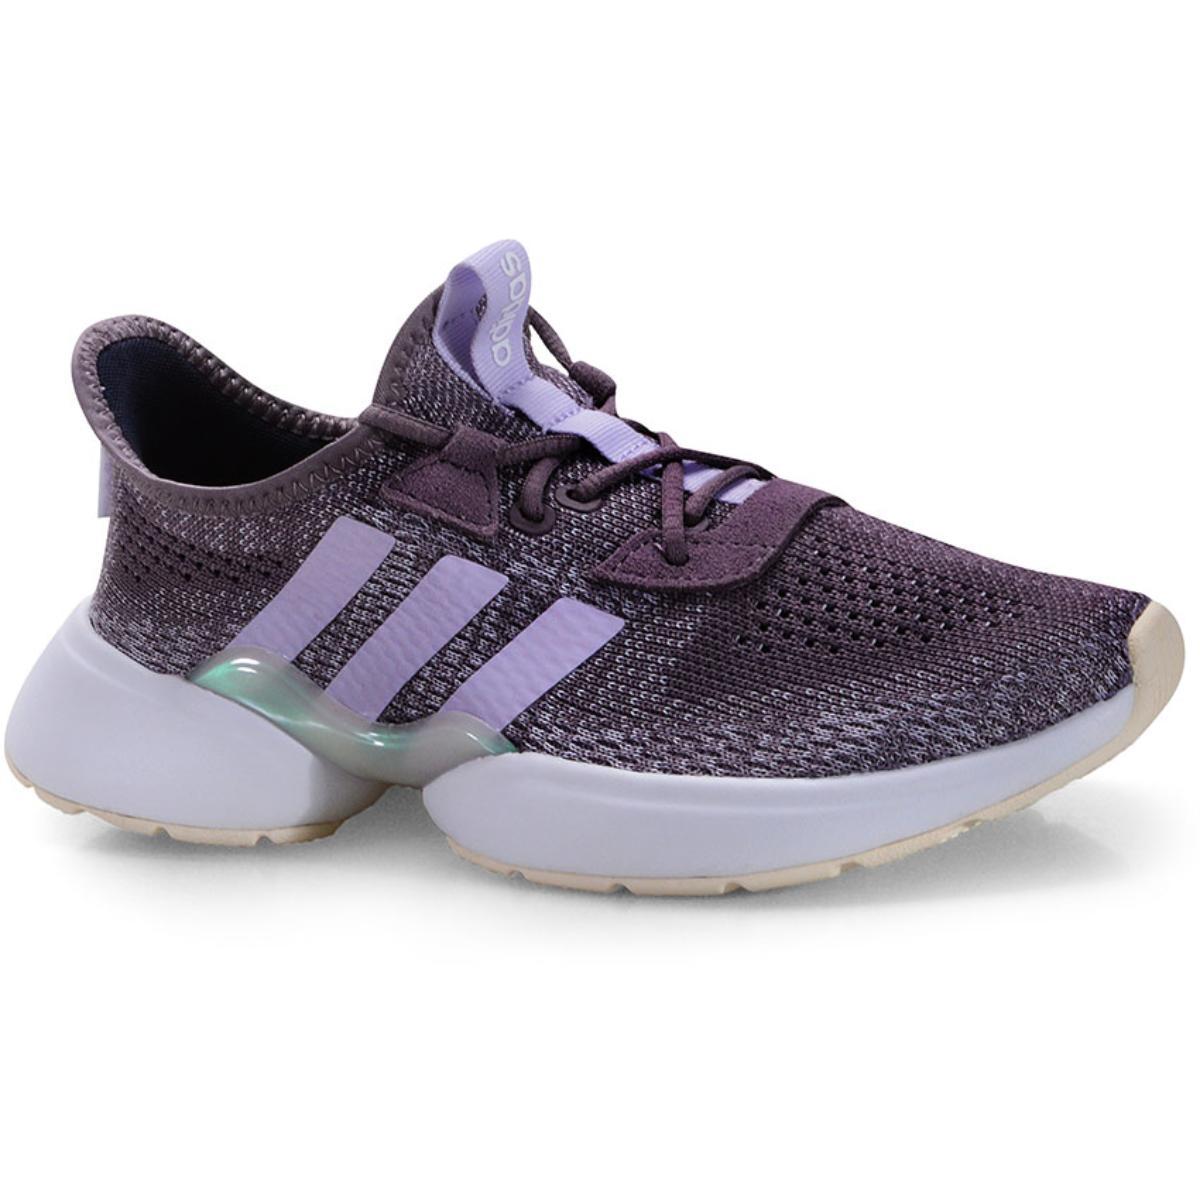 Tênis Feminino Adidas Eg4316 Mavia x w Lilas